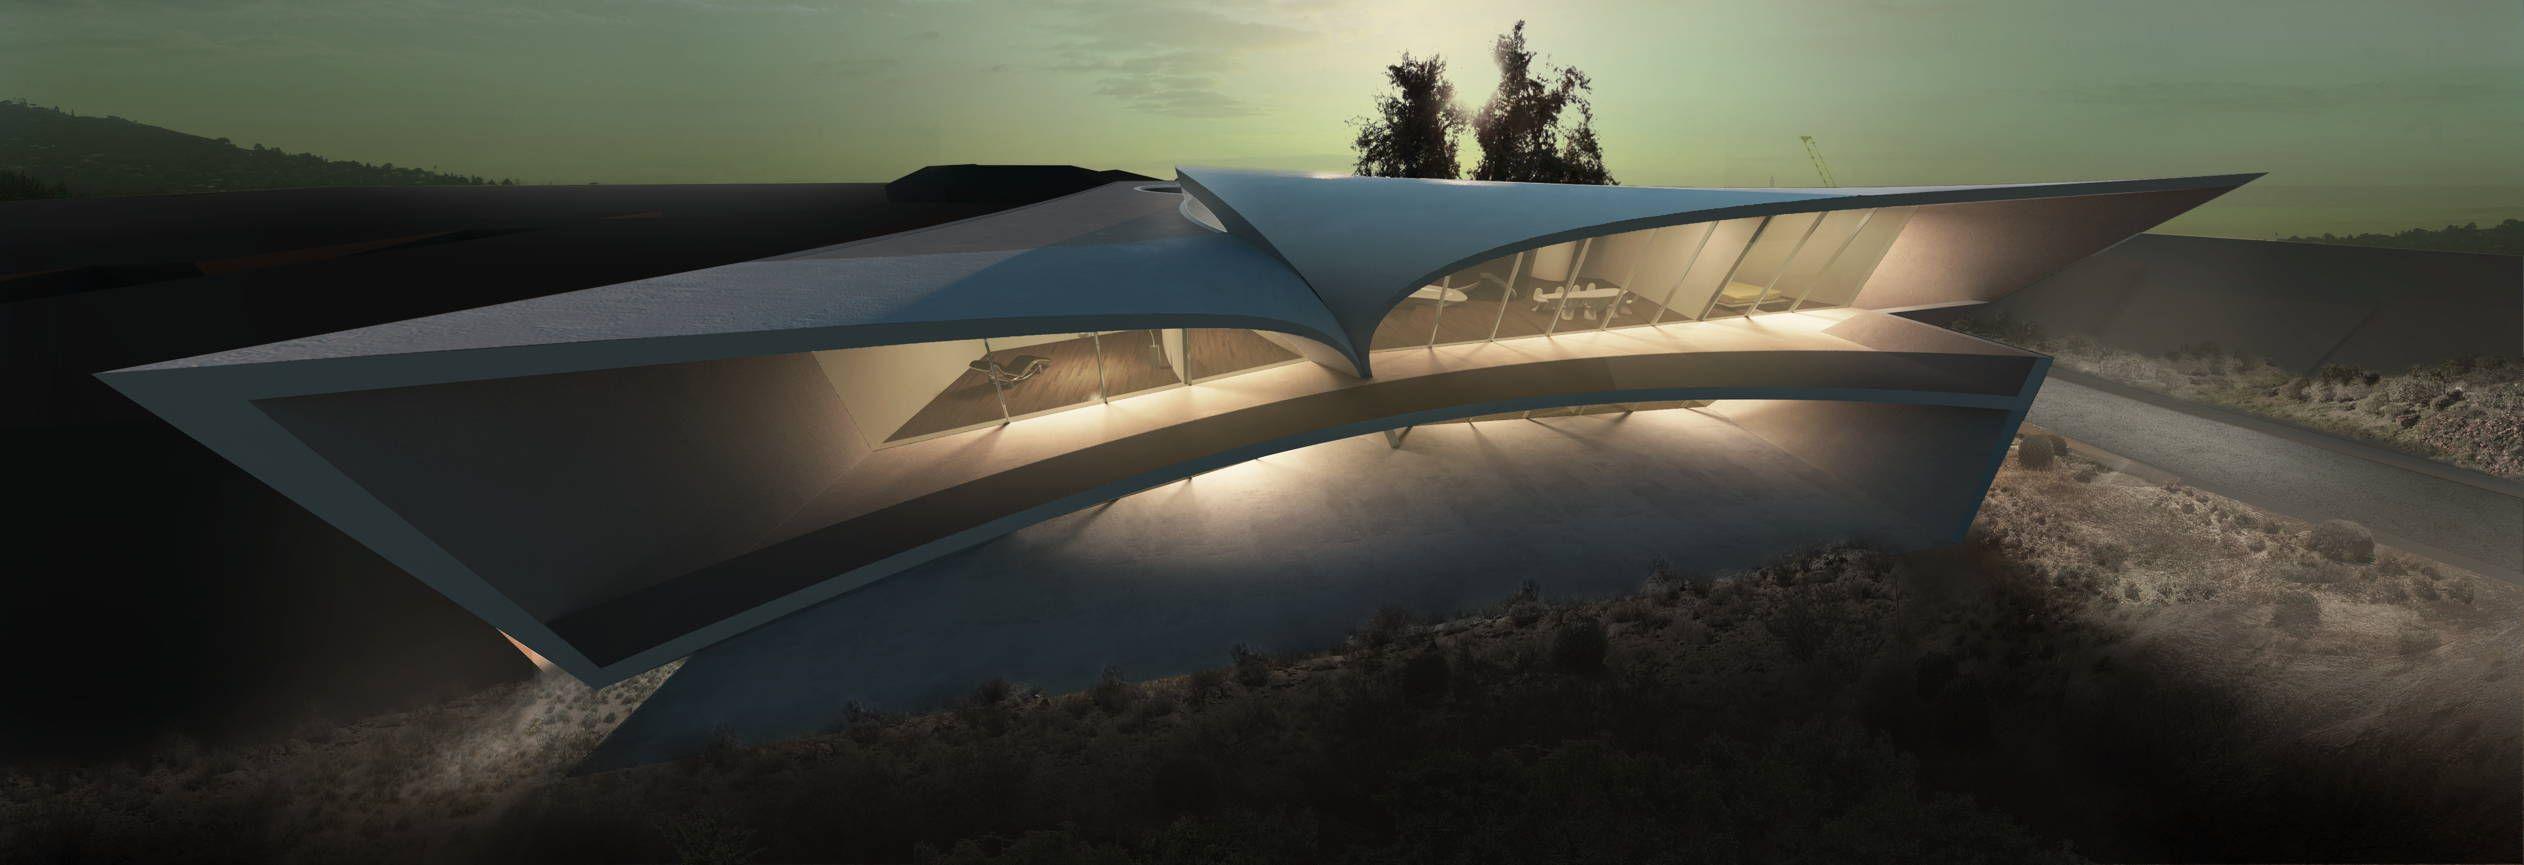 California residence zaha hadid arquitectura for Arquitectura zaha hadid